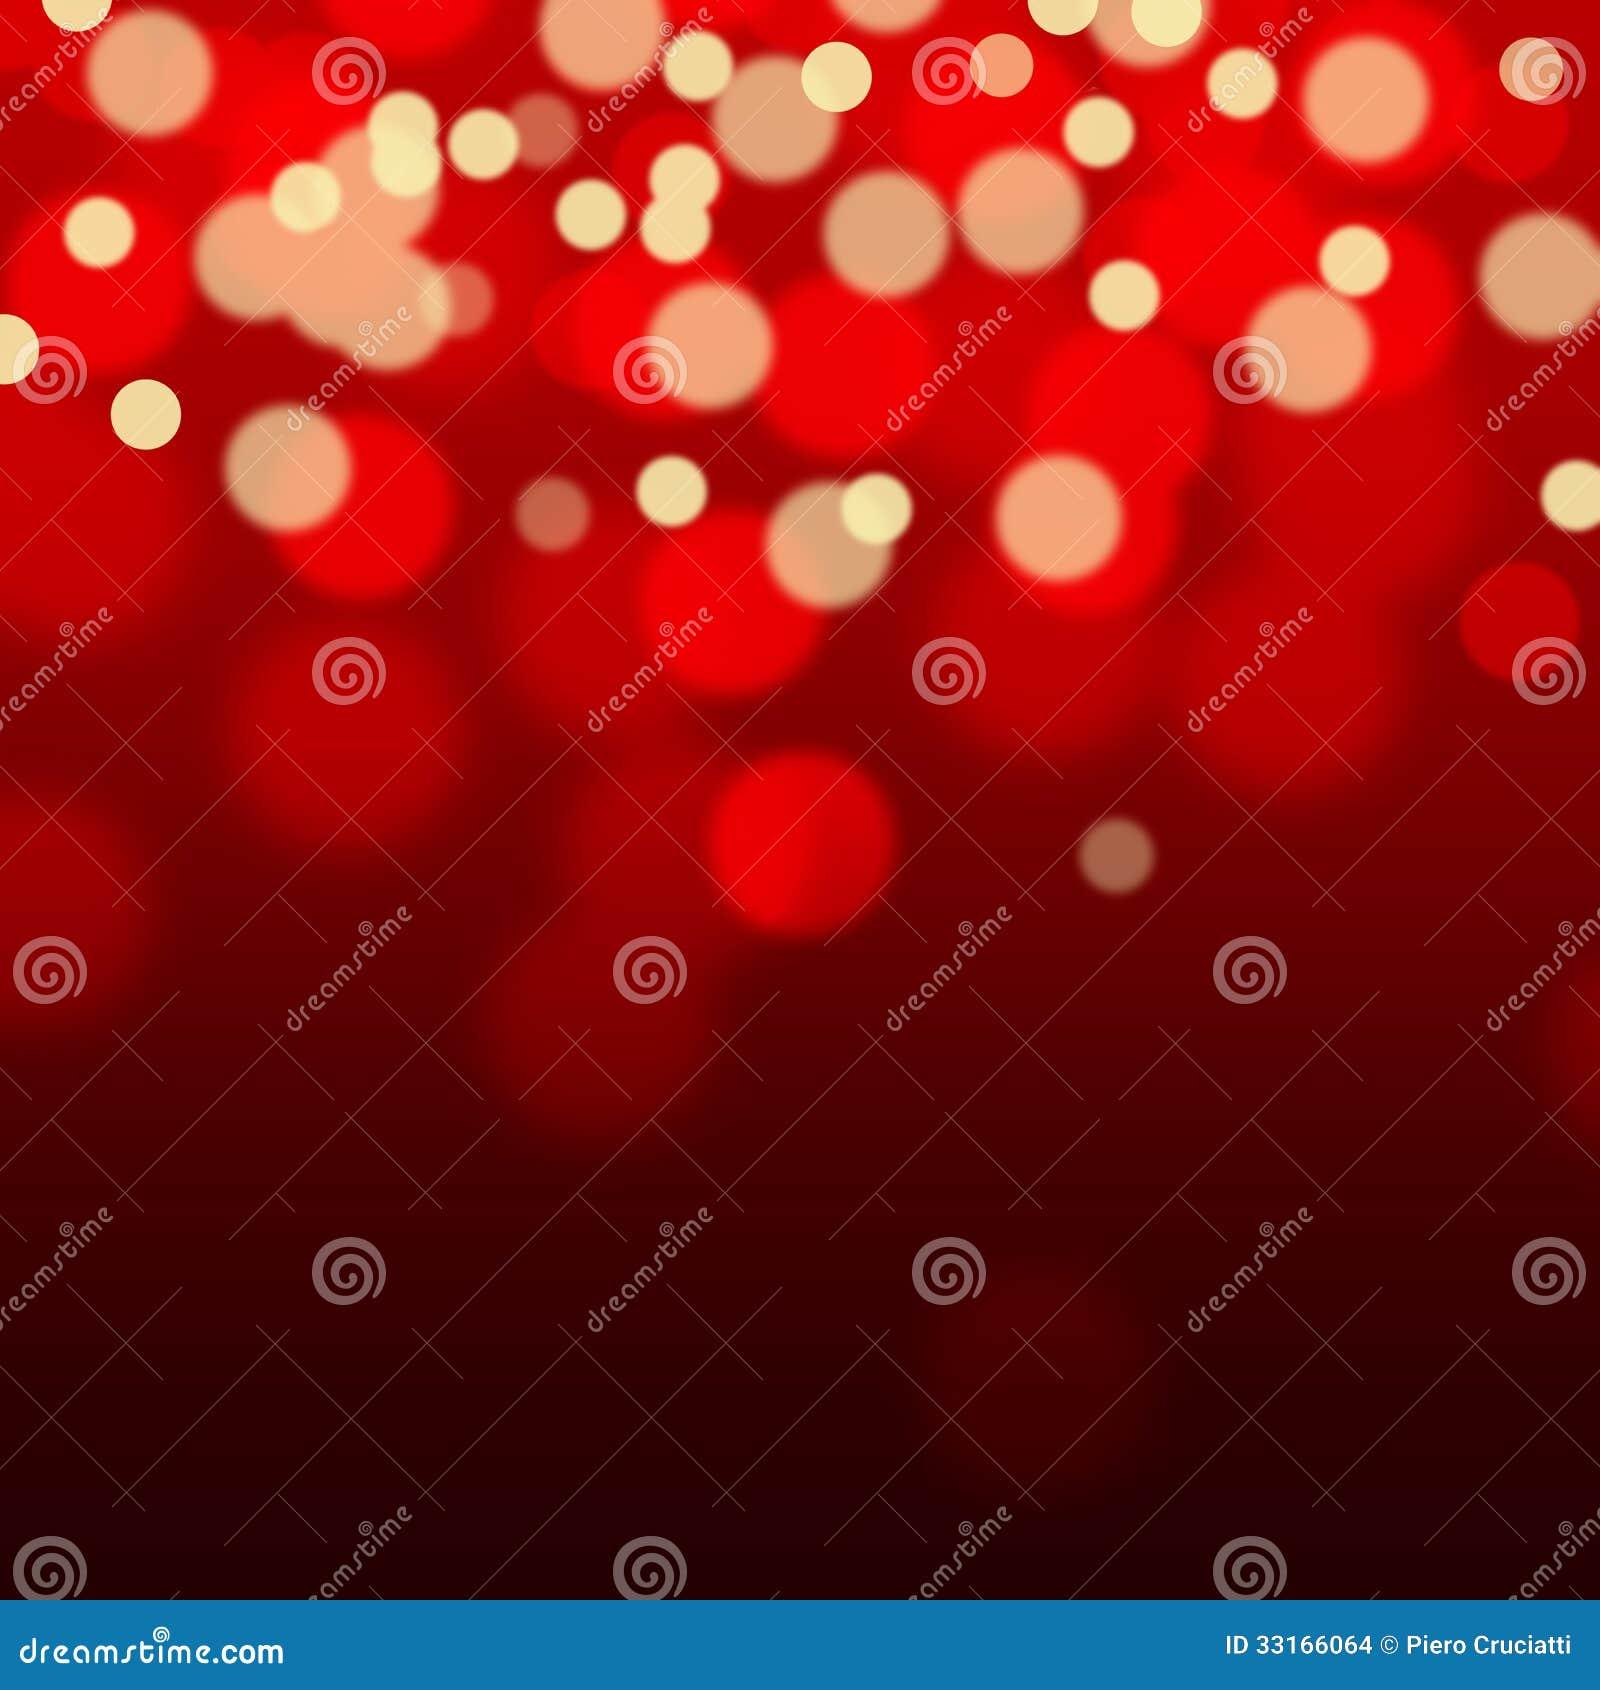 Black Friday Christmas Lights